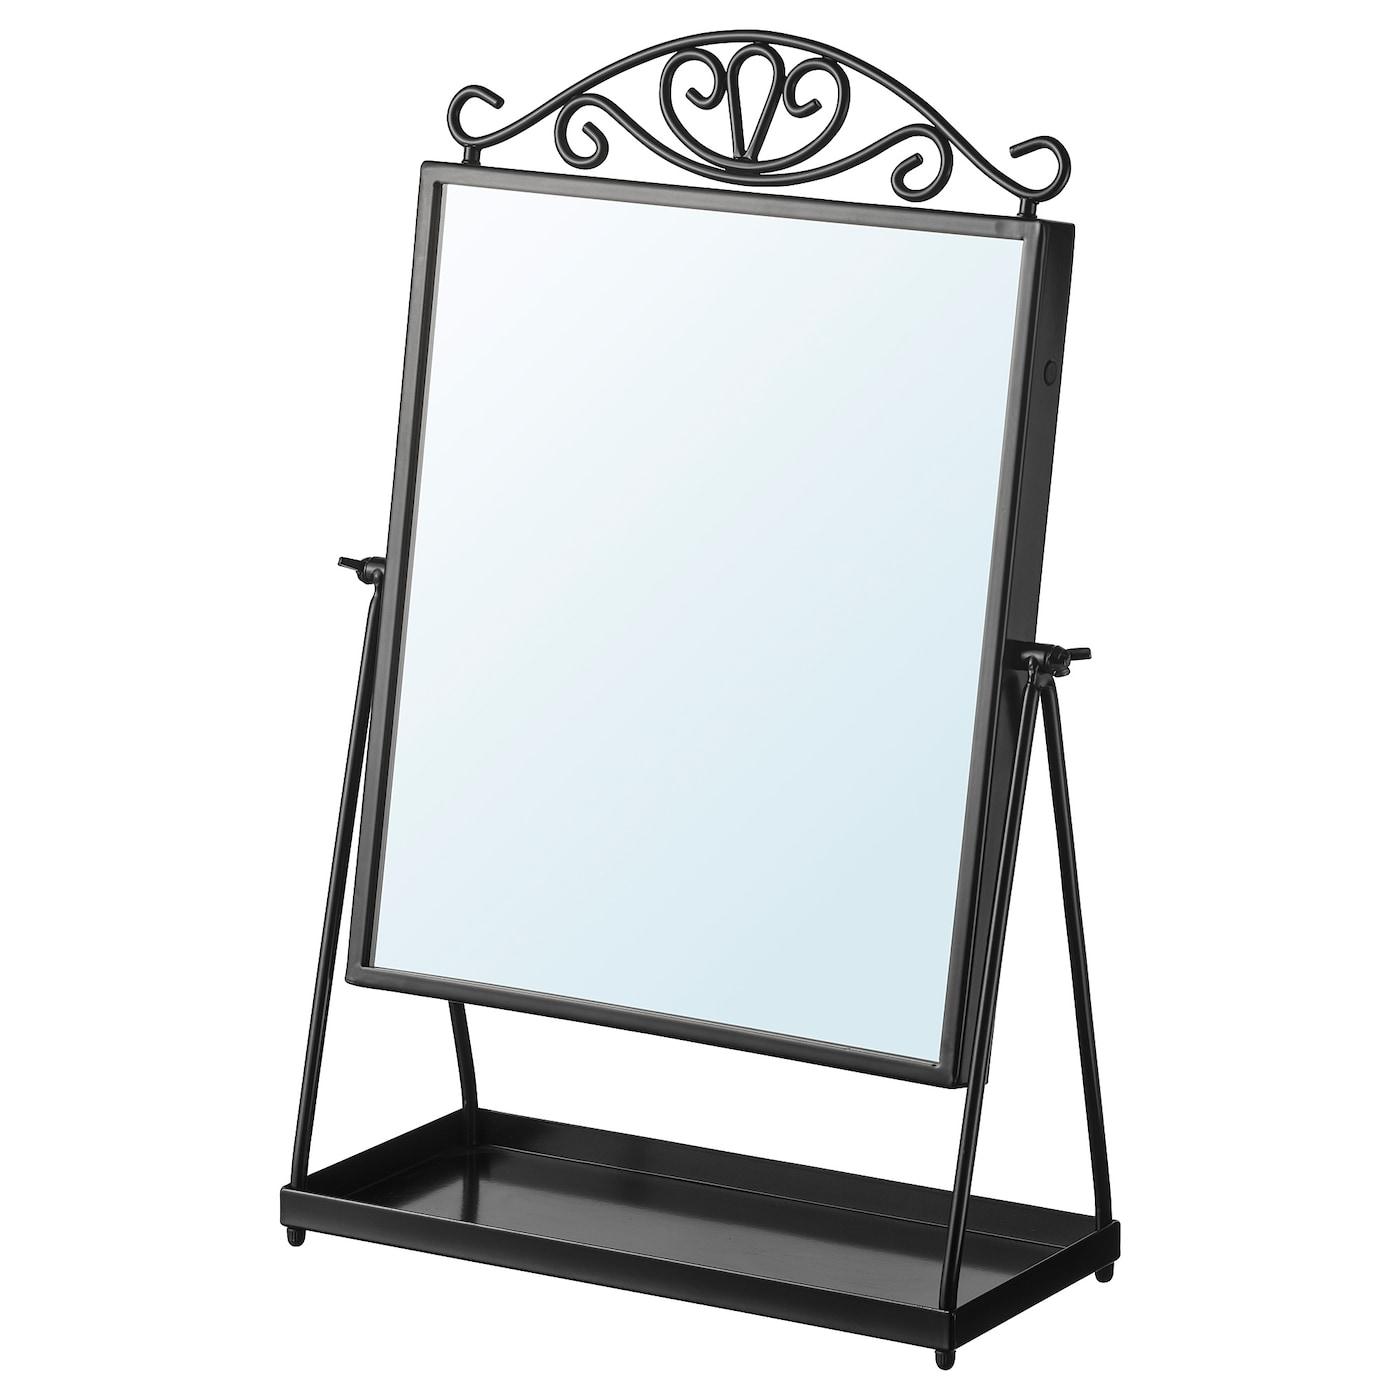 Karmsund Black Table Mirror 27x43 Cm Ikea